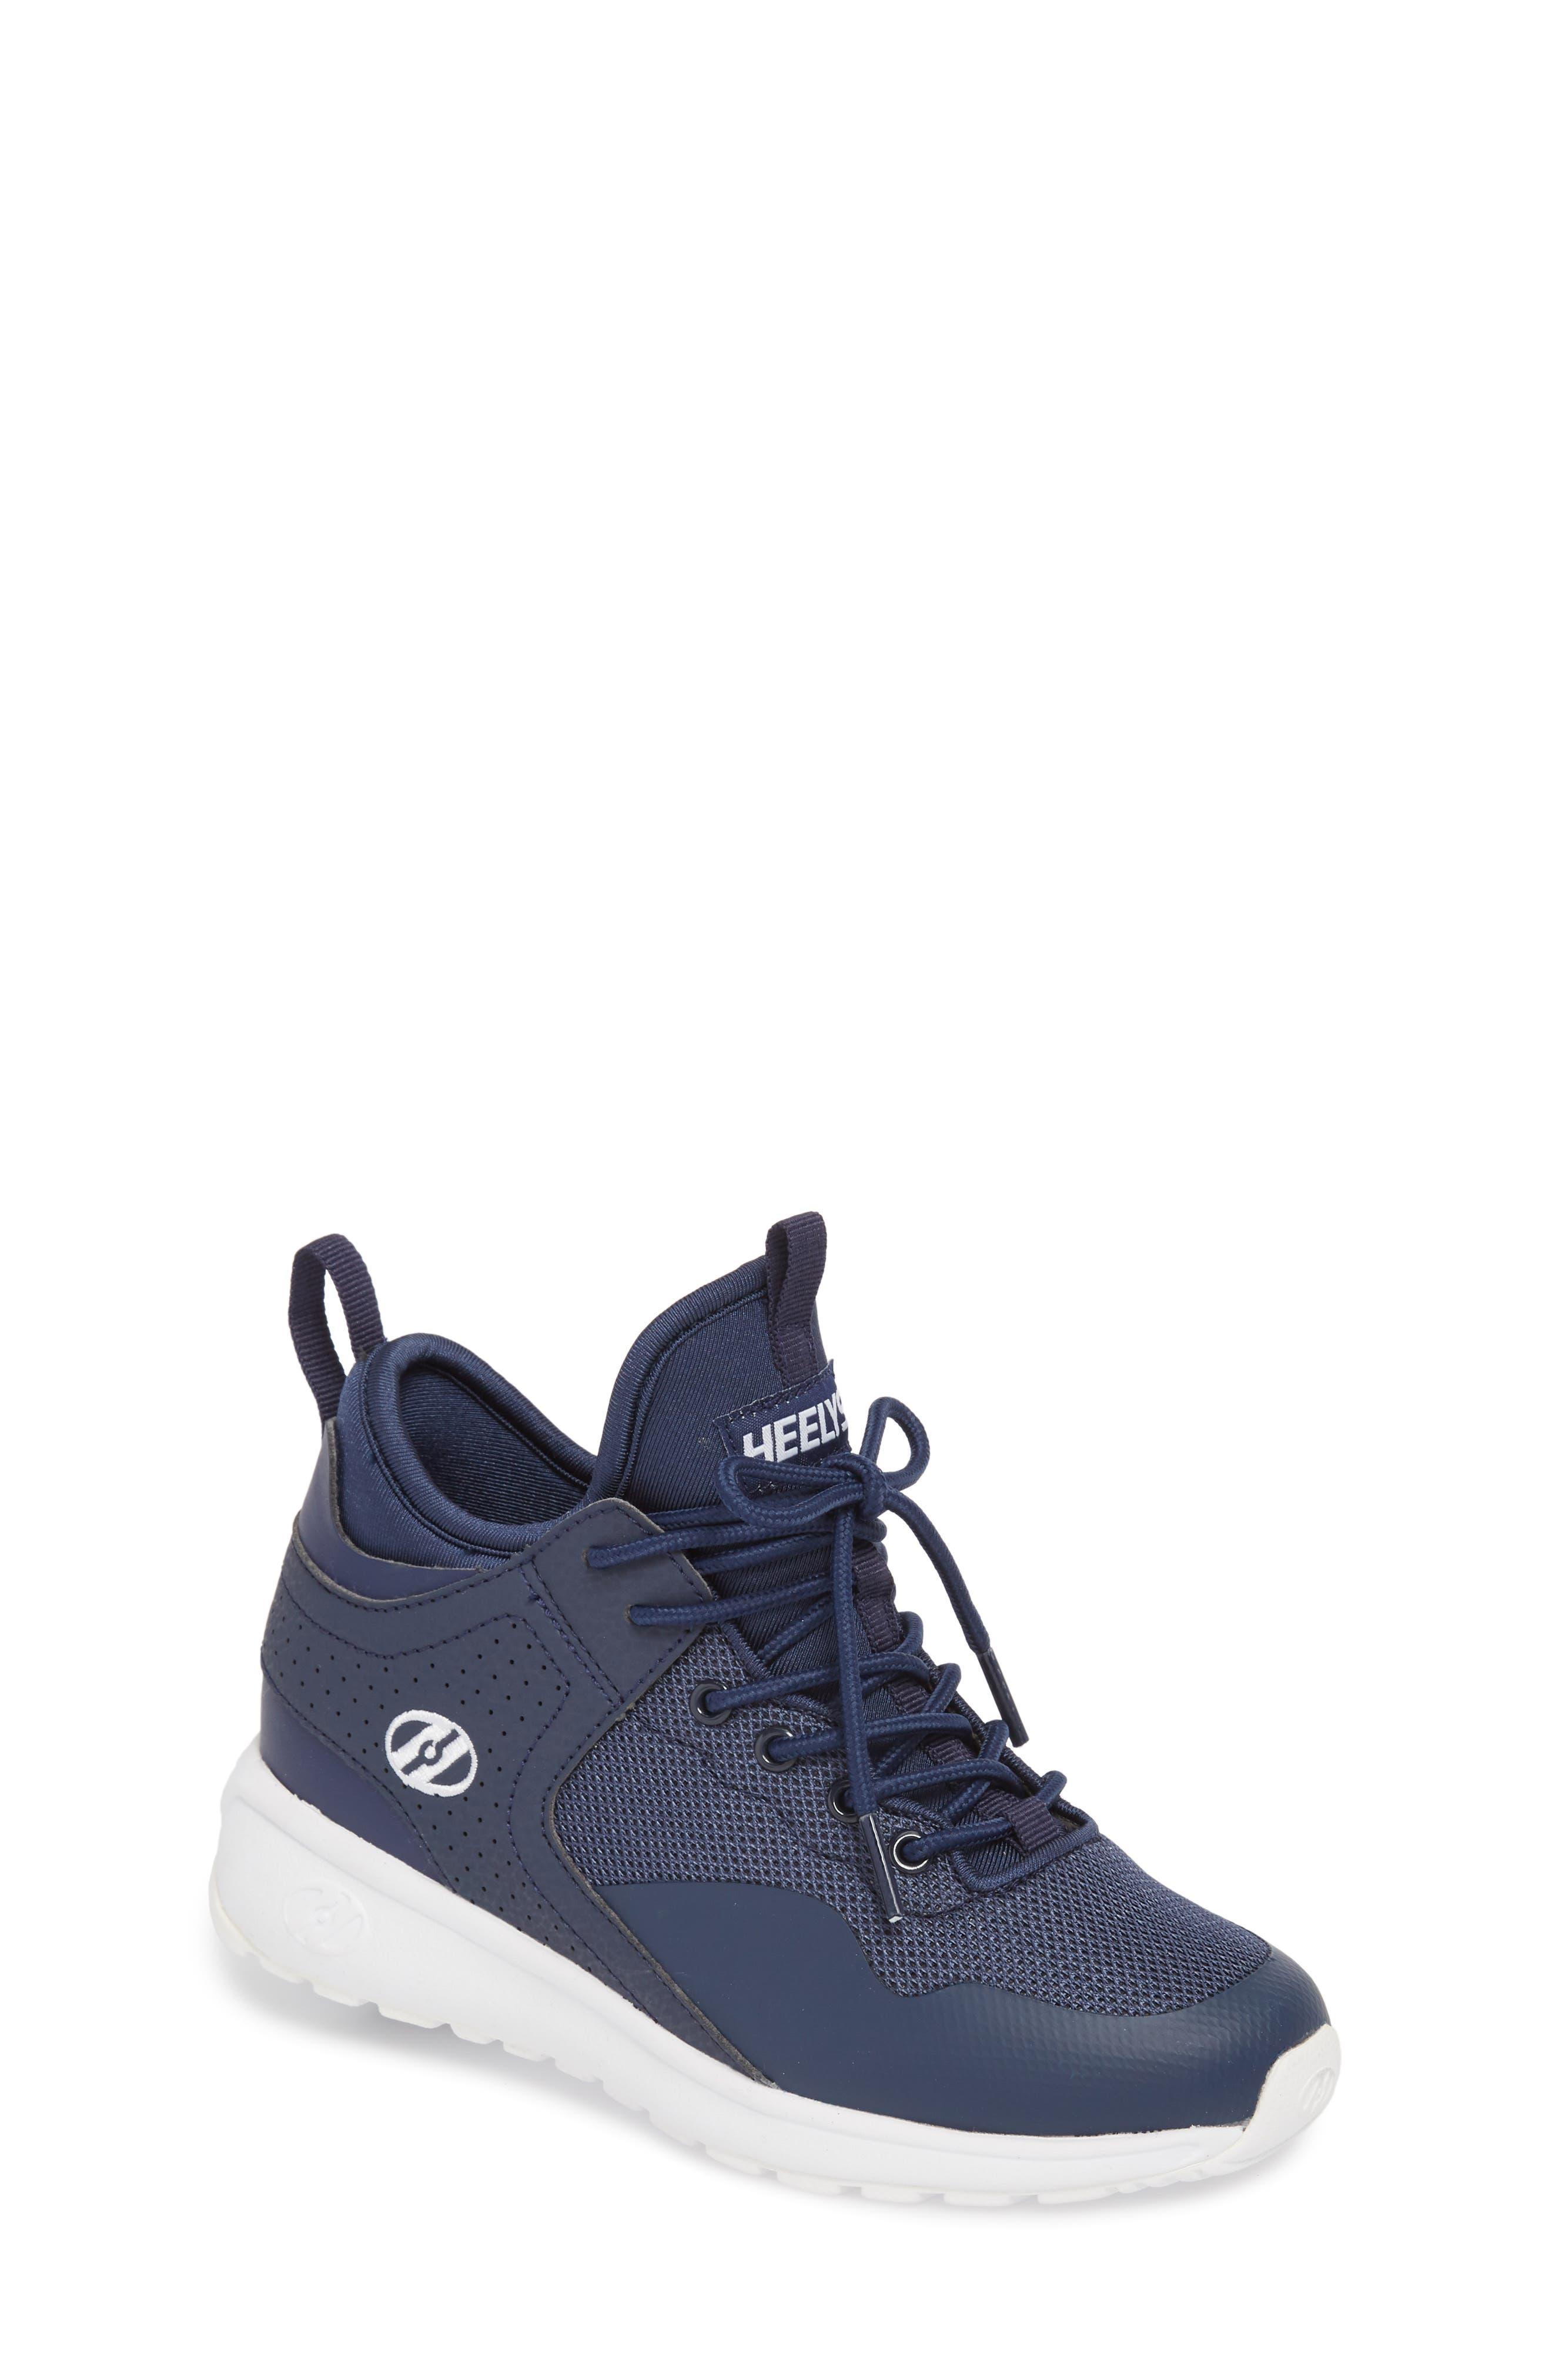 Piper Sneaker,                             Main thumbnail 1, color,                             411